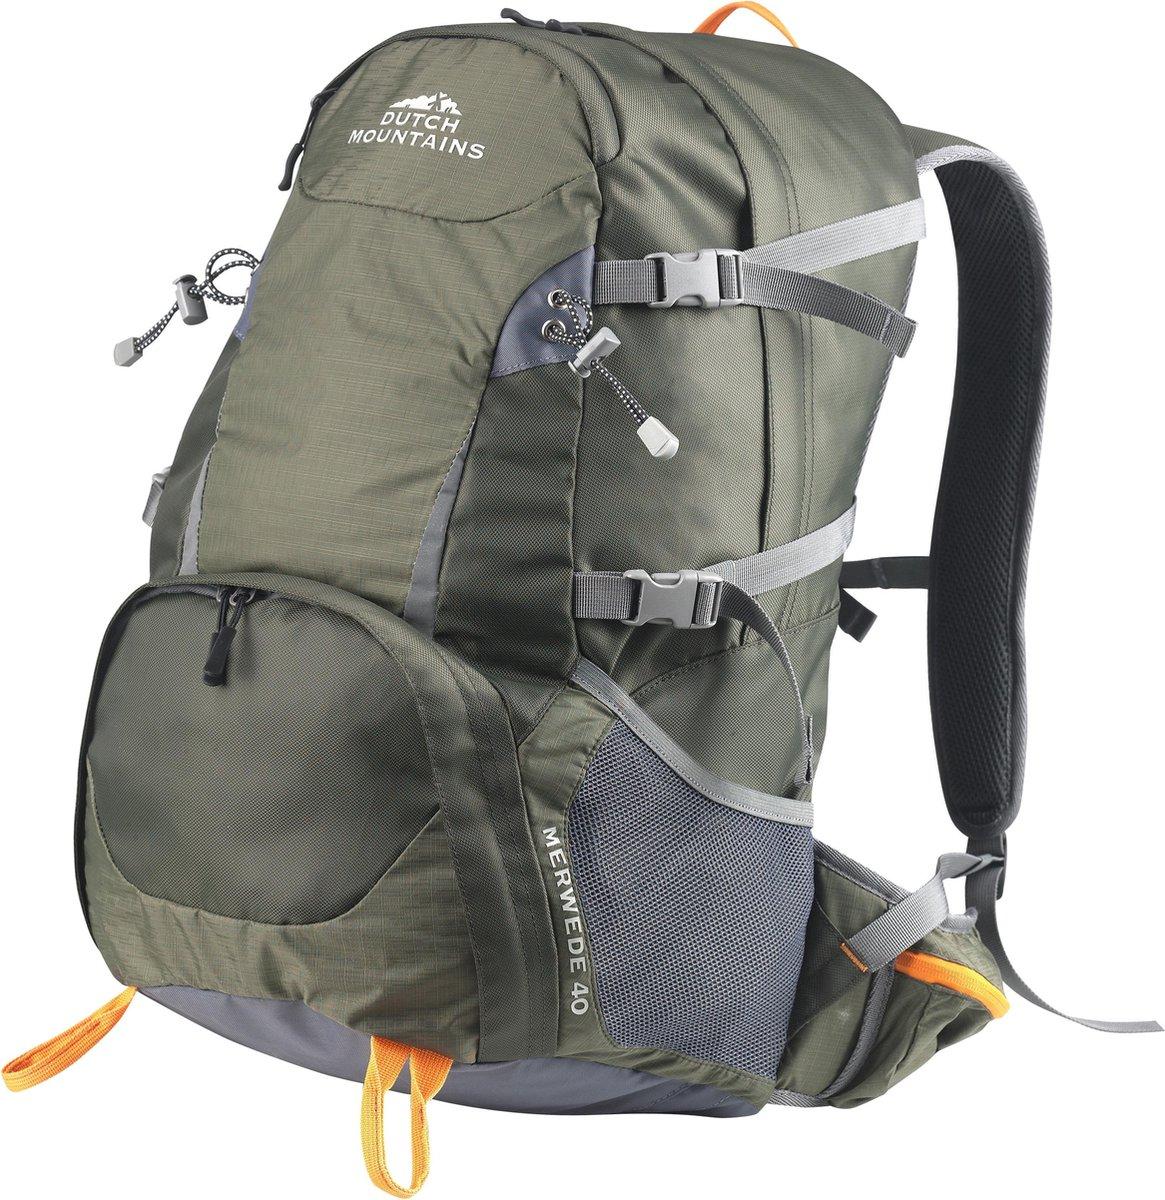 Dutch Mountains® 'Merwede' Backpack - Wandel Rugzak - Inclusief Regenhoes - 40 Liter - Groen